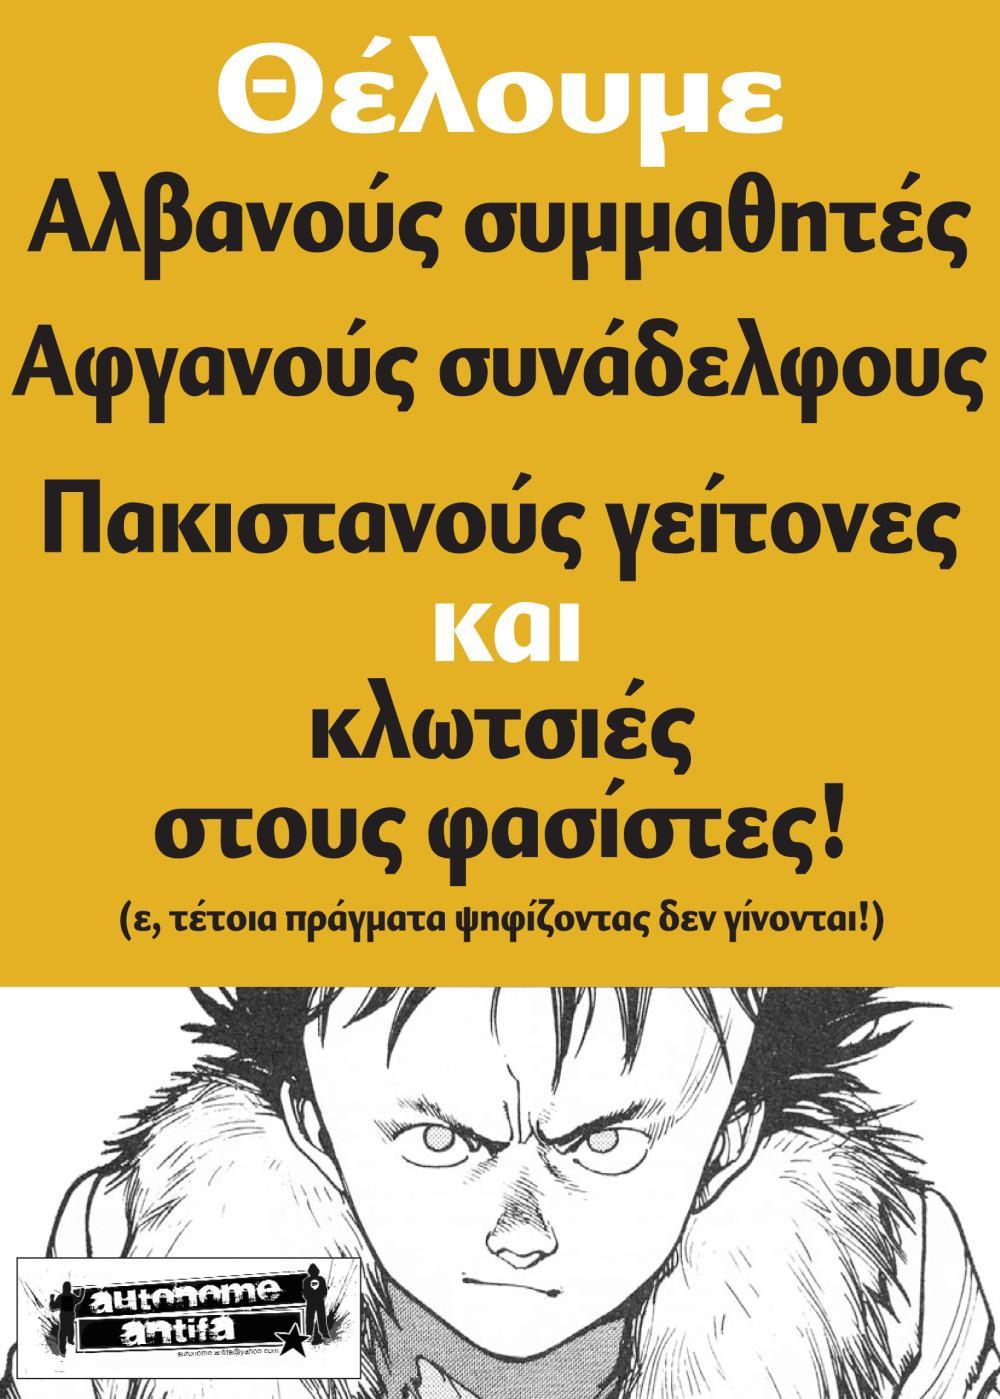 http://www.anarxeio.gr/files/img/AutonomeAntifa_2010-10_Ekloges_ST.jpg